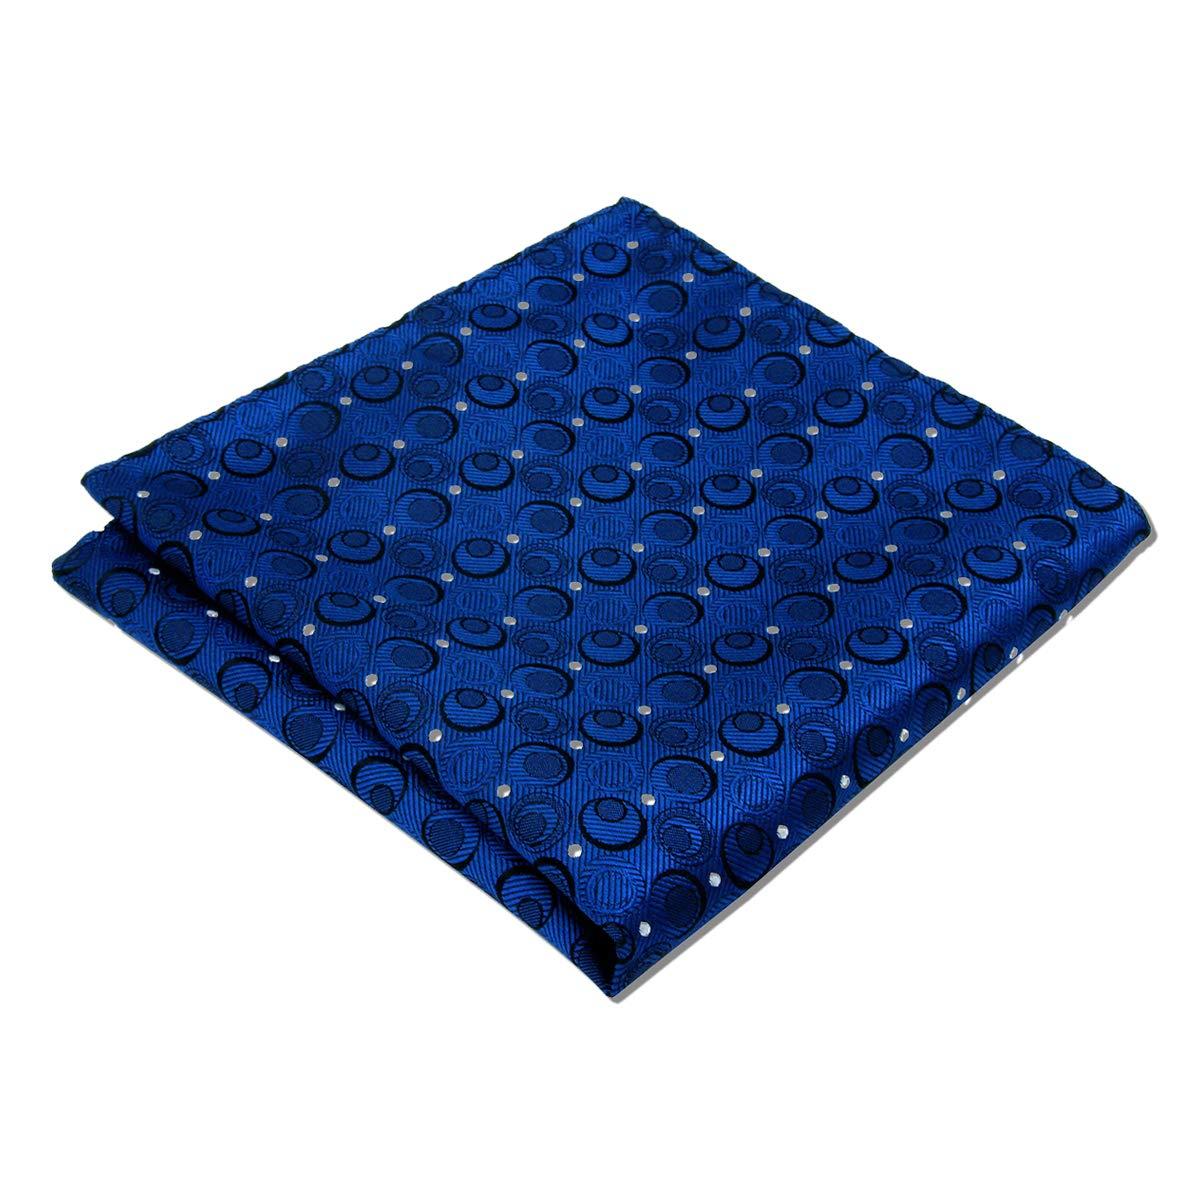 Shlax /& Wing Navy Hanky Dots Mens Pocket Square Blue Large 12.6